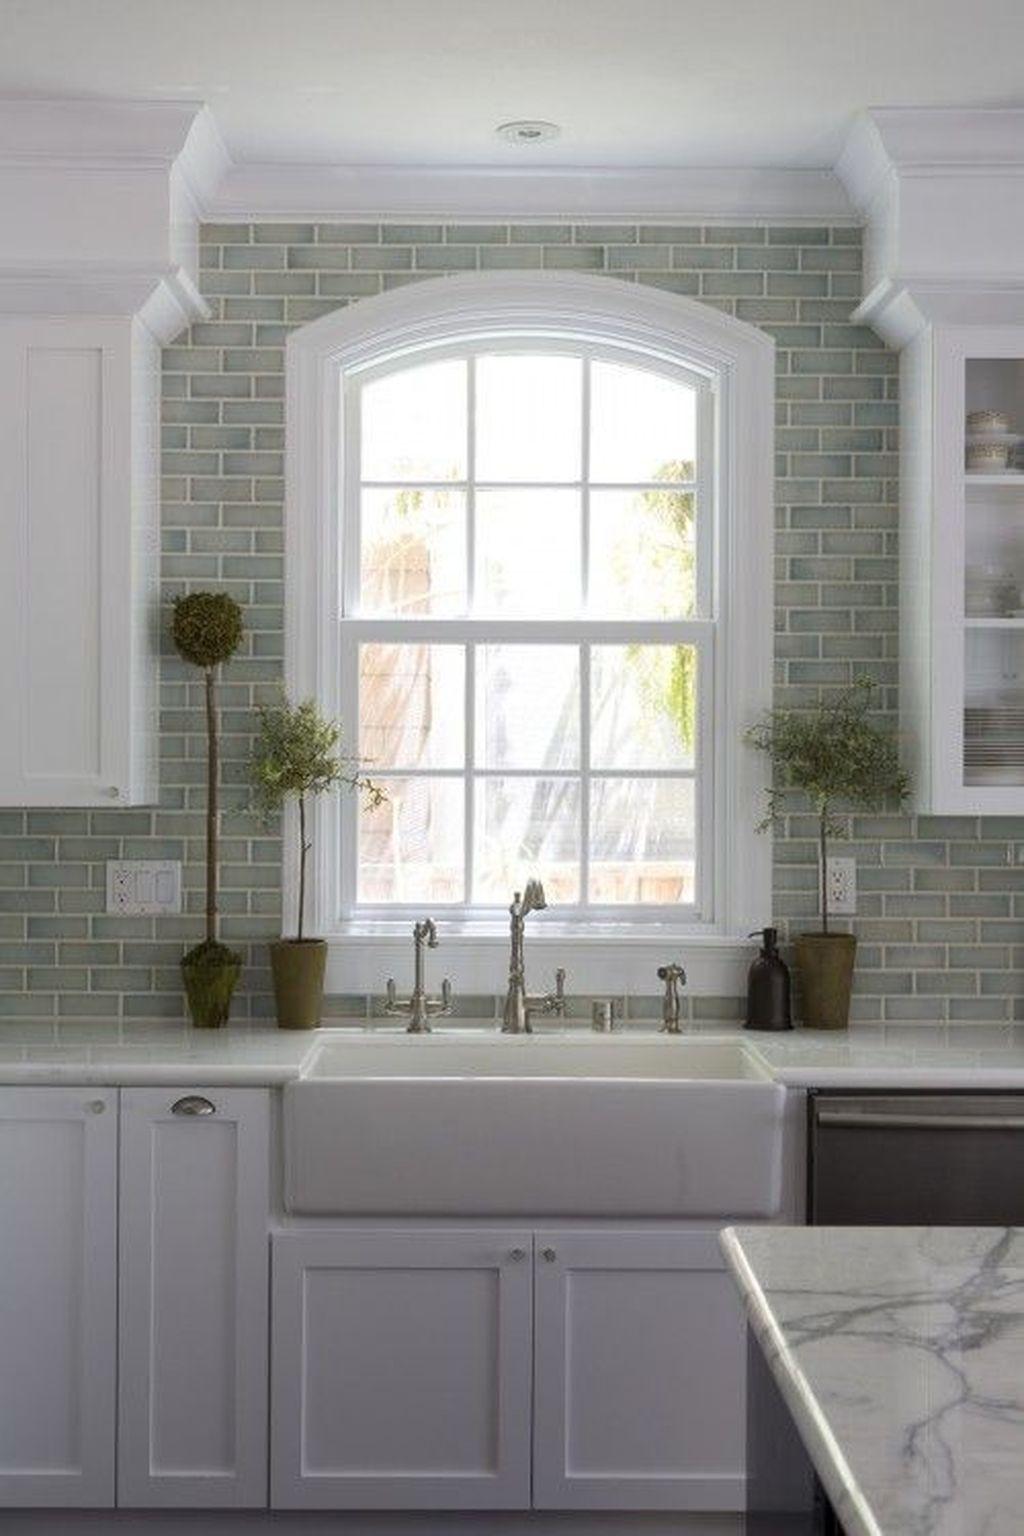 Bay Window Ideas Will Help You To Enjoy Window The Area Around Your Bay Window Curtains And Bay Window Treatme Kitchen Design Kitchen Interior Kitchen Remodel